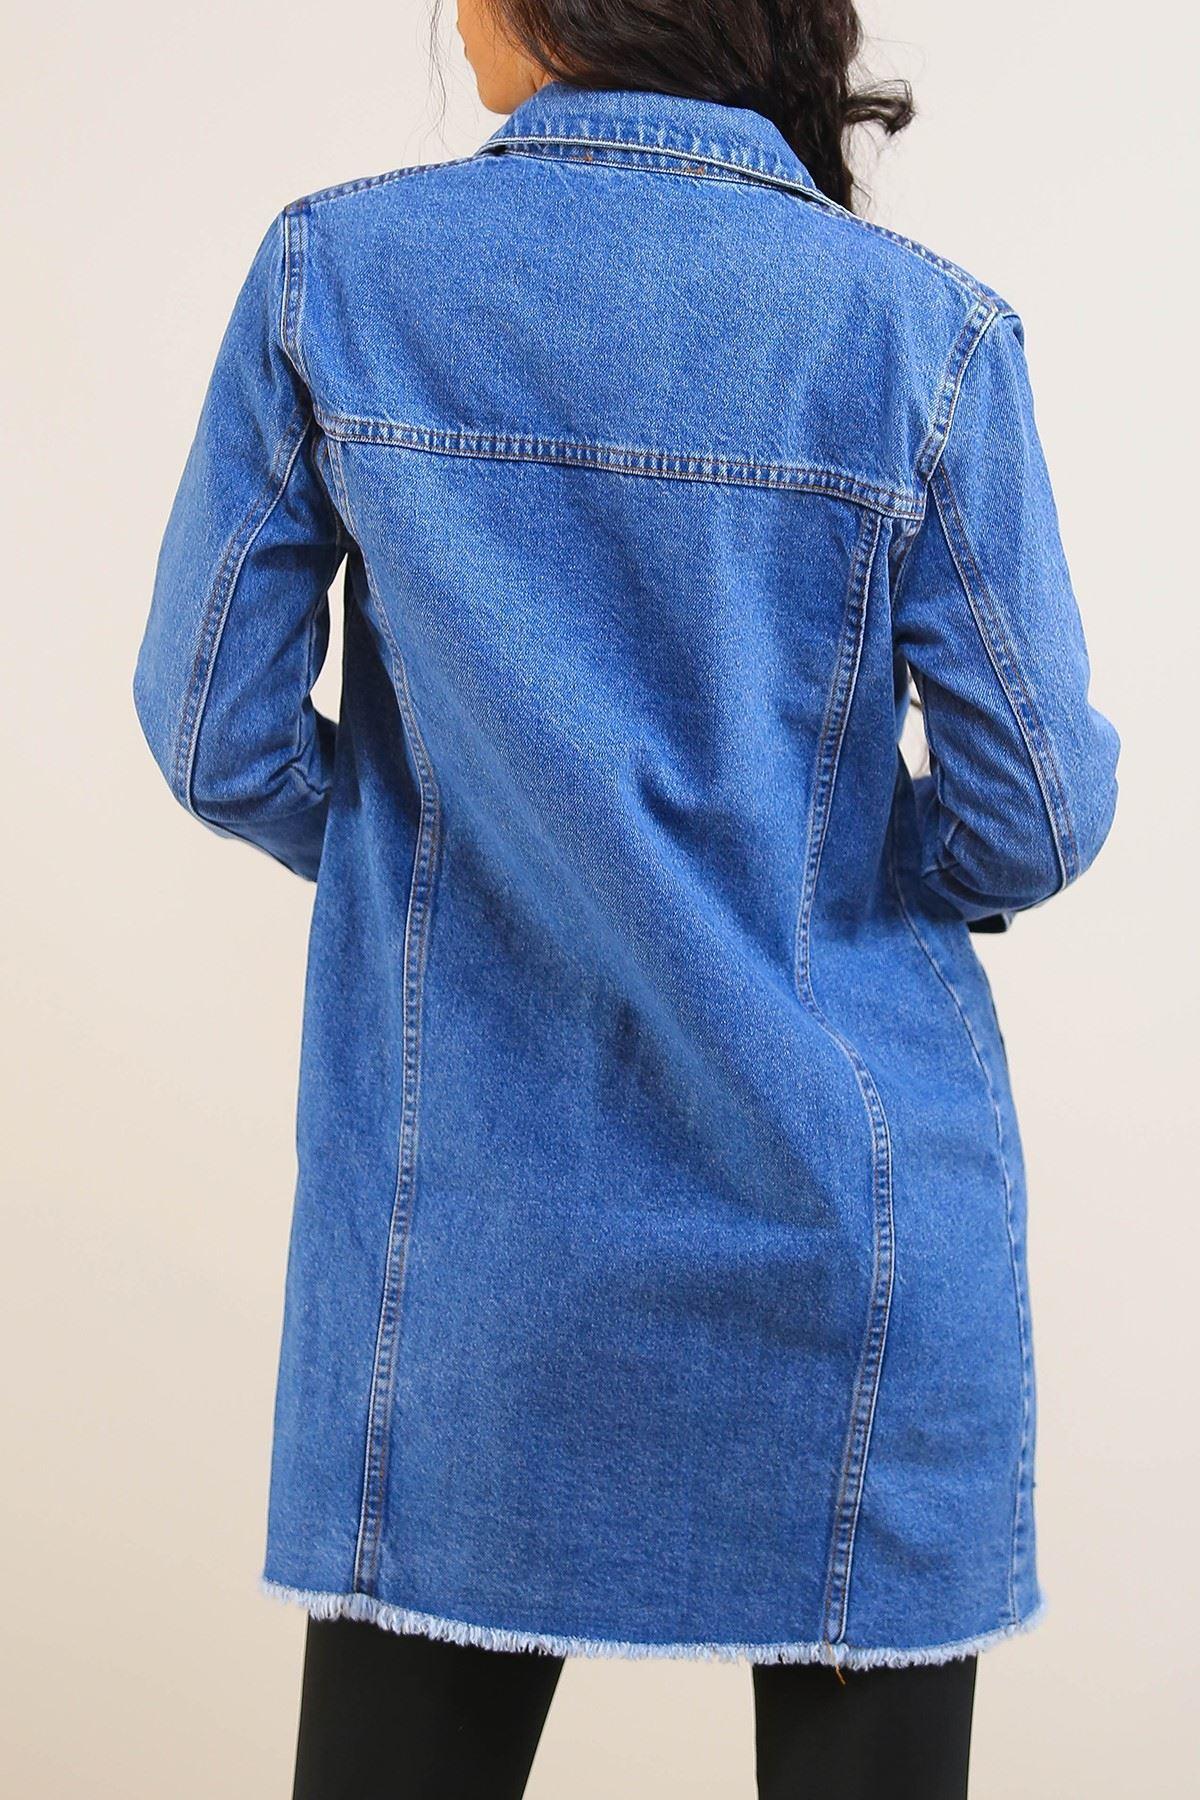 Tunik Kot Ceket Mavi - 5234.299.